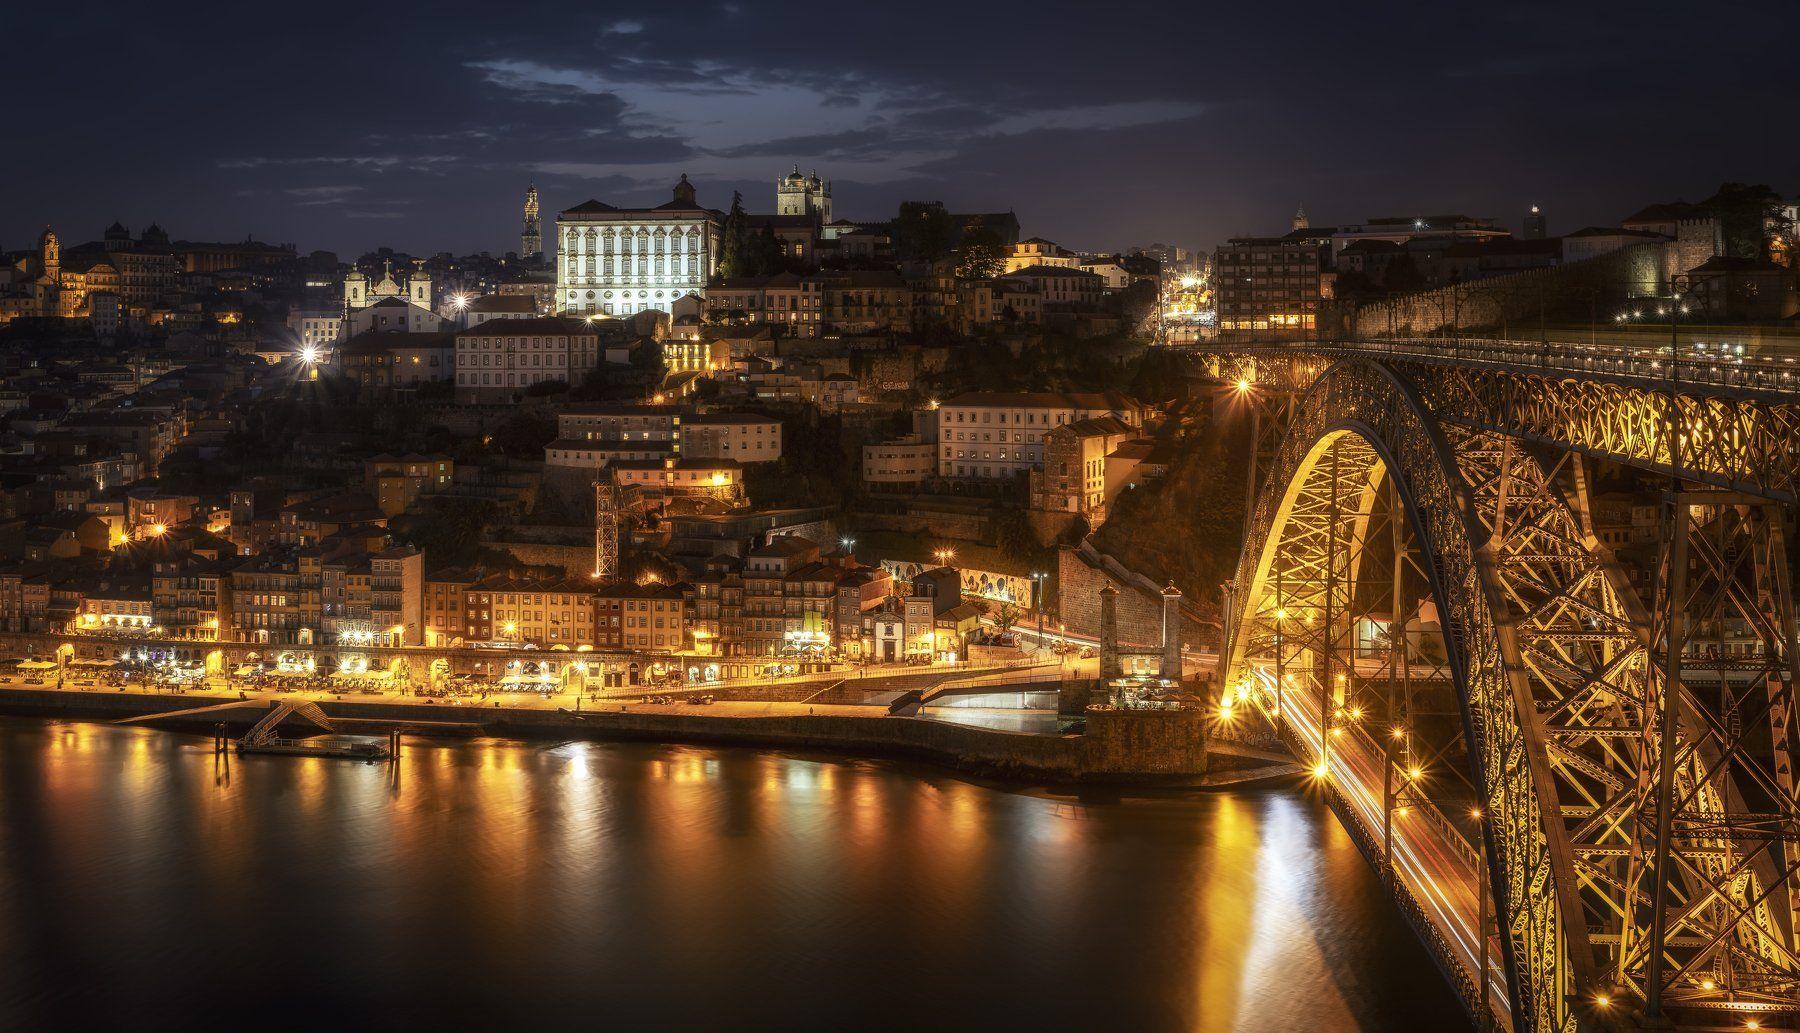 город, португалия, мост, Alexandr Bezmolitvenny